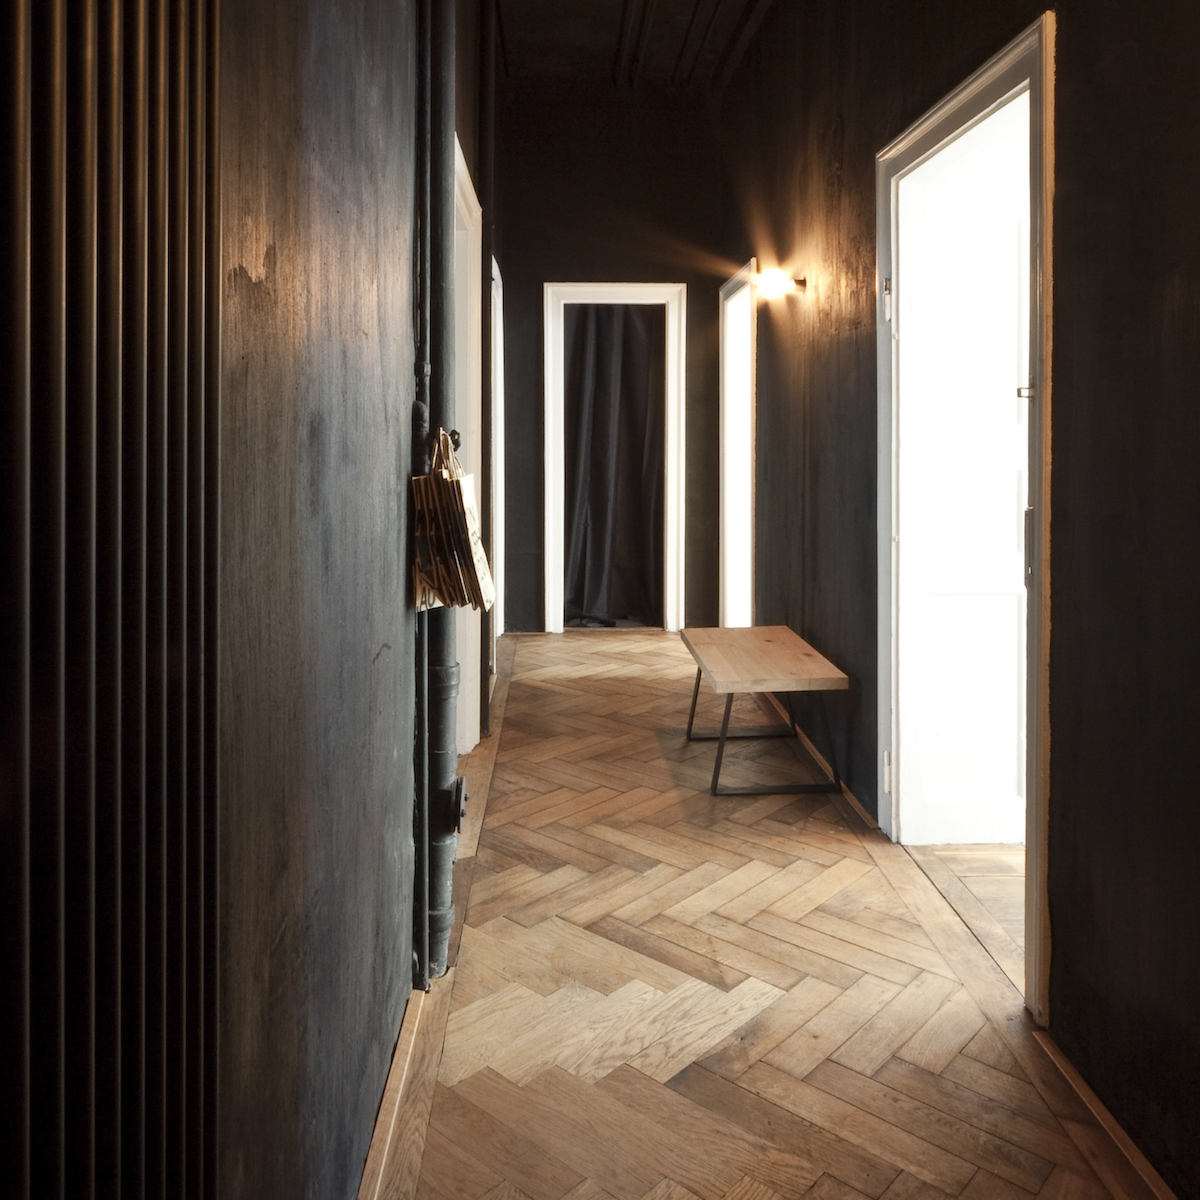 Dressler Friseur Salon Schwabing_Schwarz als Wandfarbe